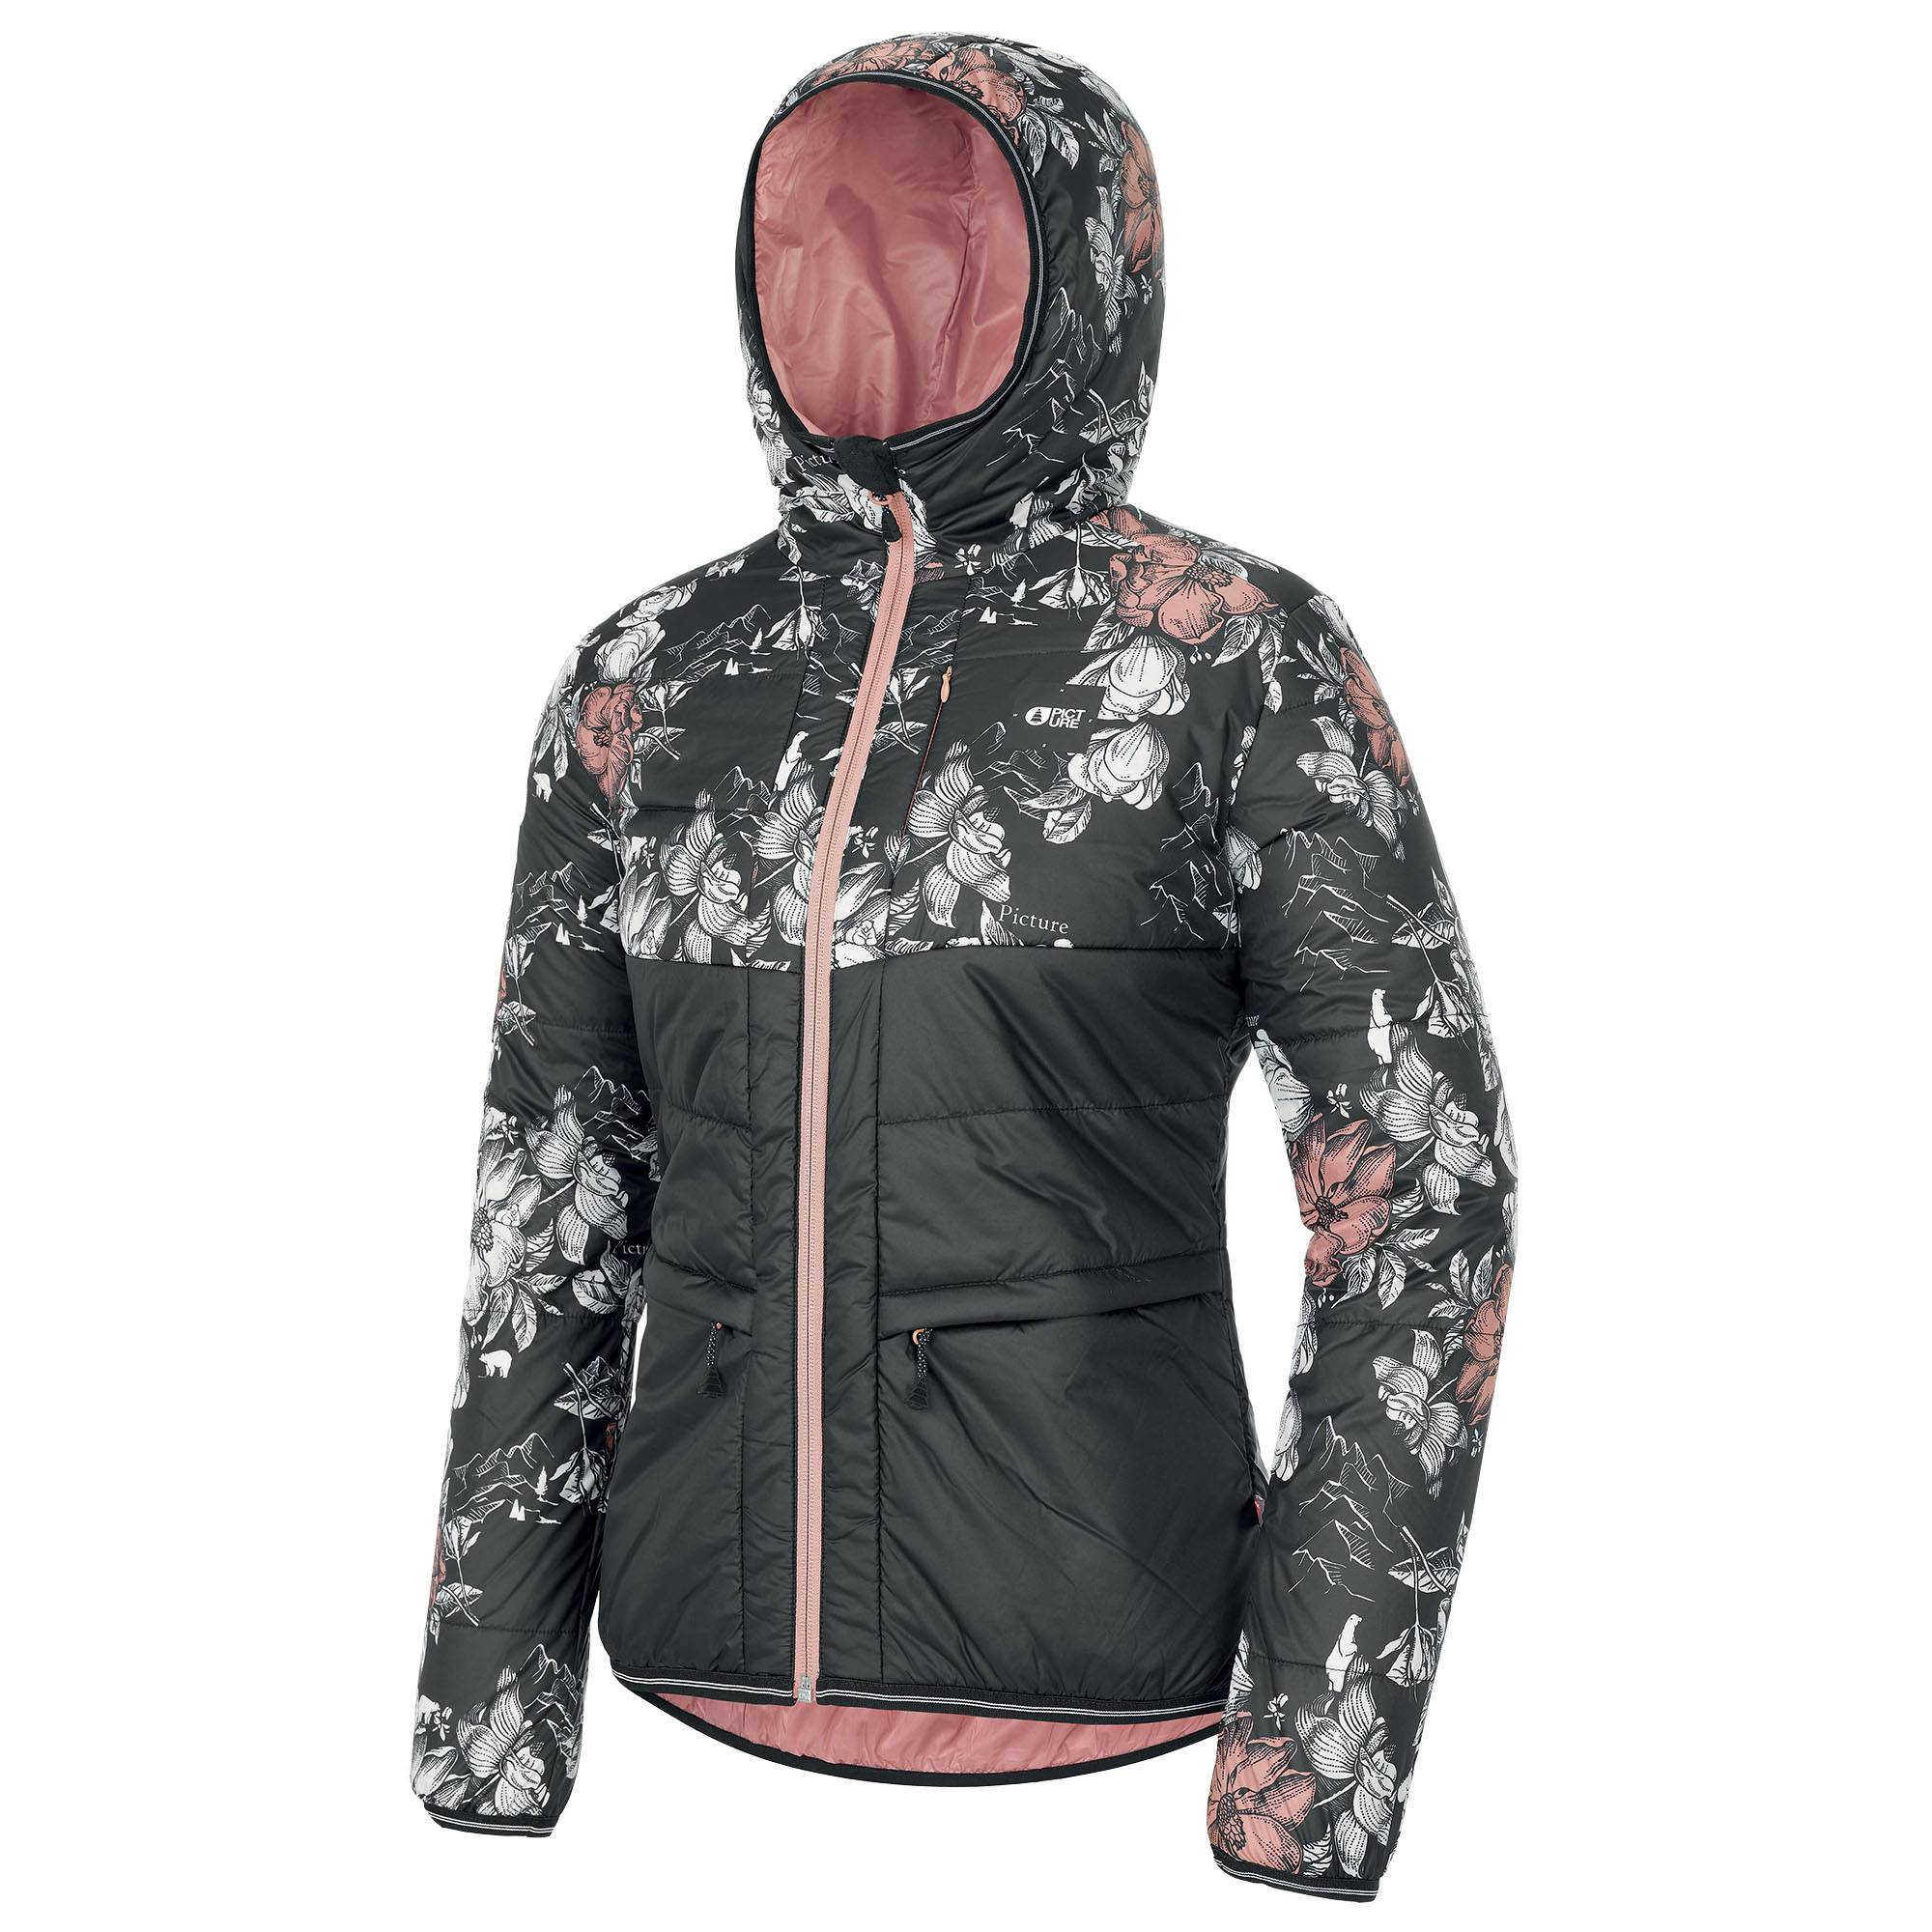 Picture Organic Clothing Women's Kallya Snow Jacket  - Peonies Black - Size: Small